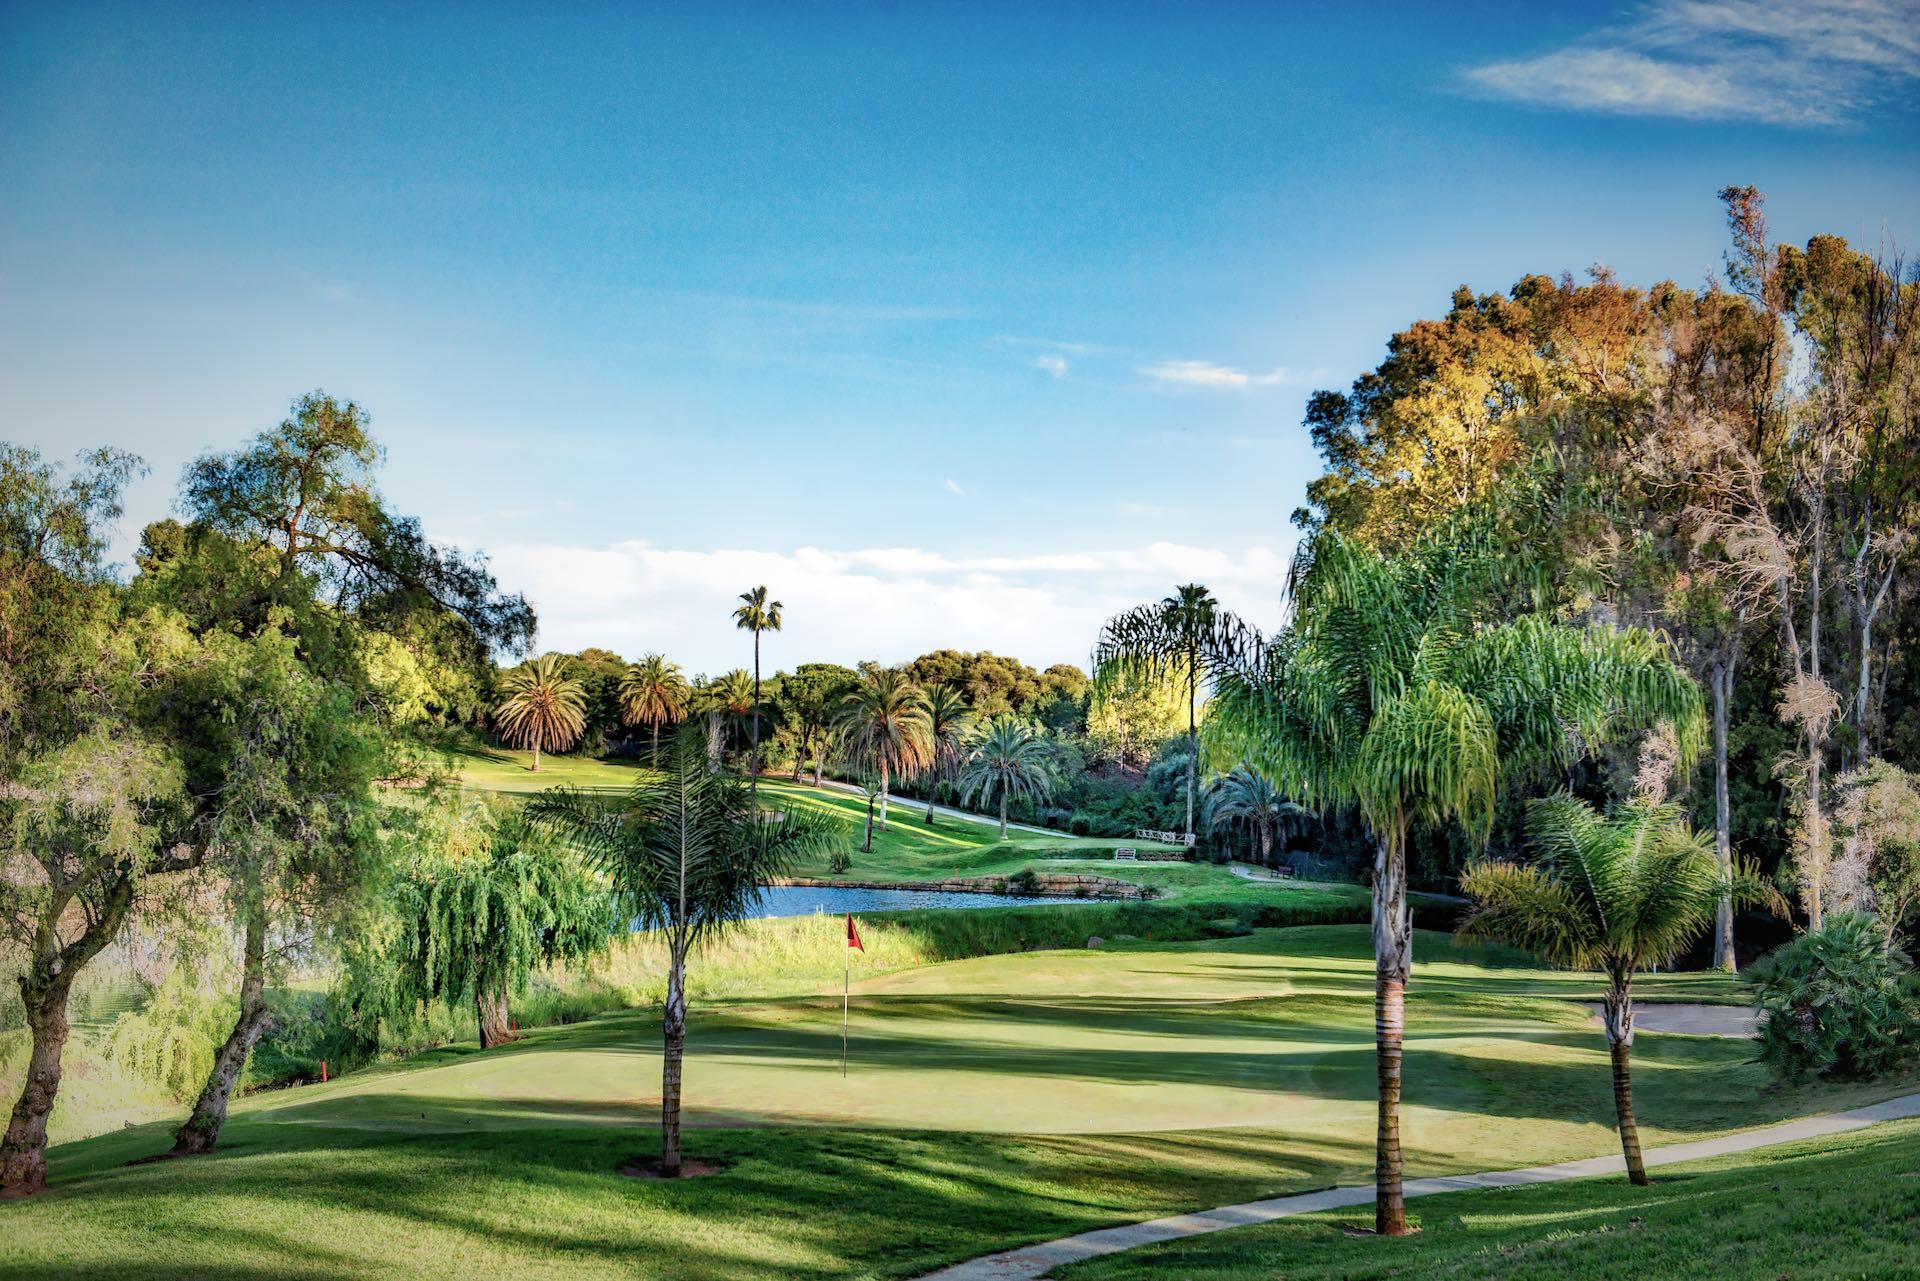 El Paraiso Golf Club Estepona Malaga Costa del Sol